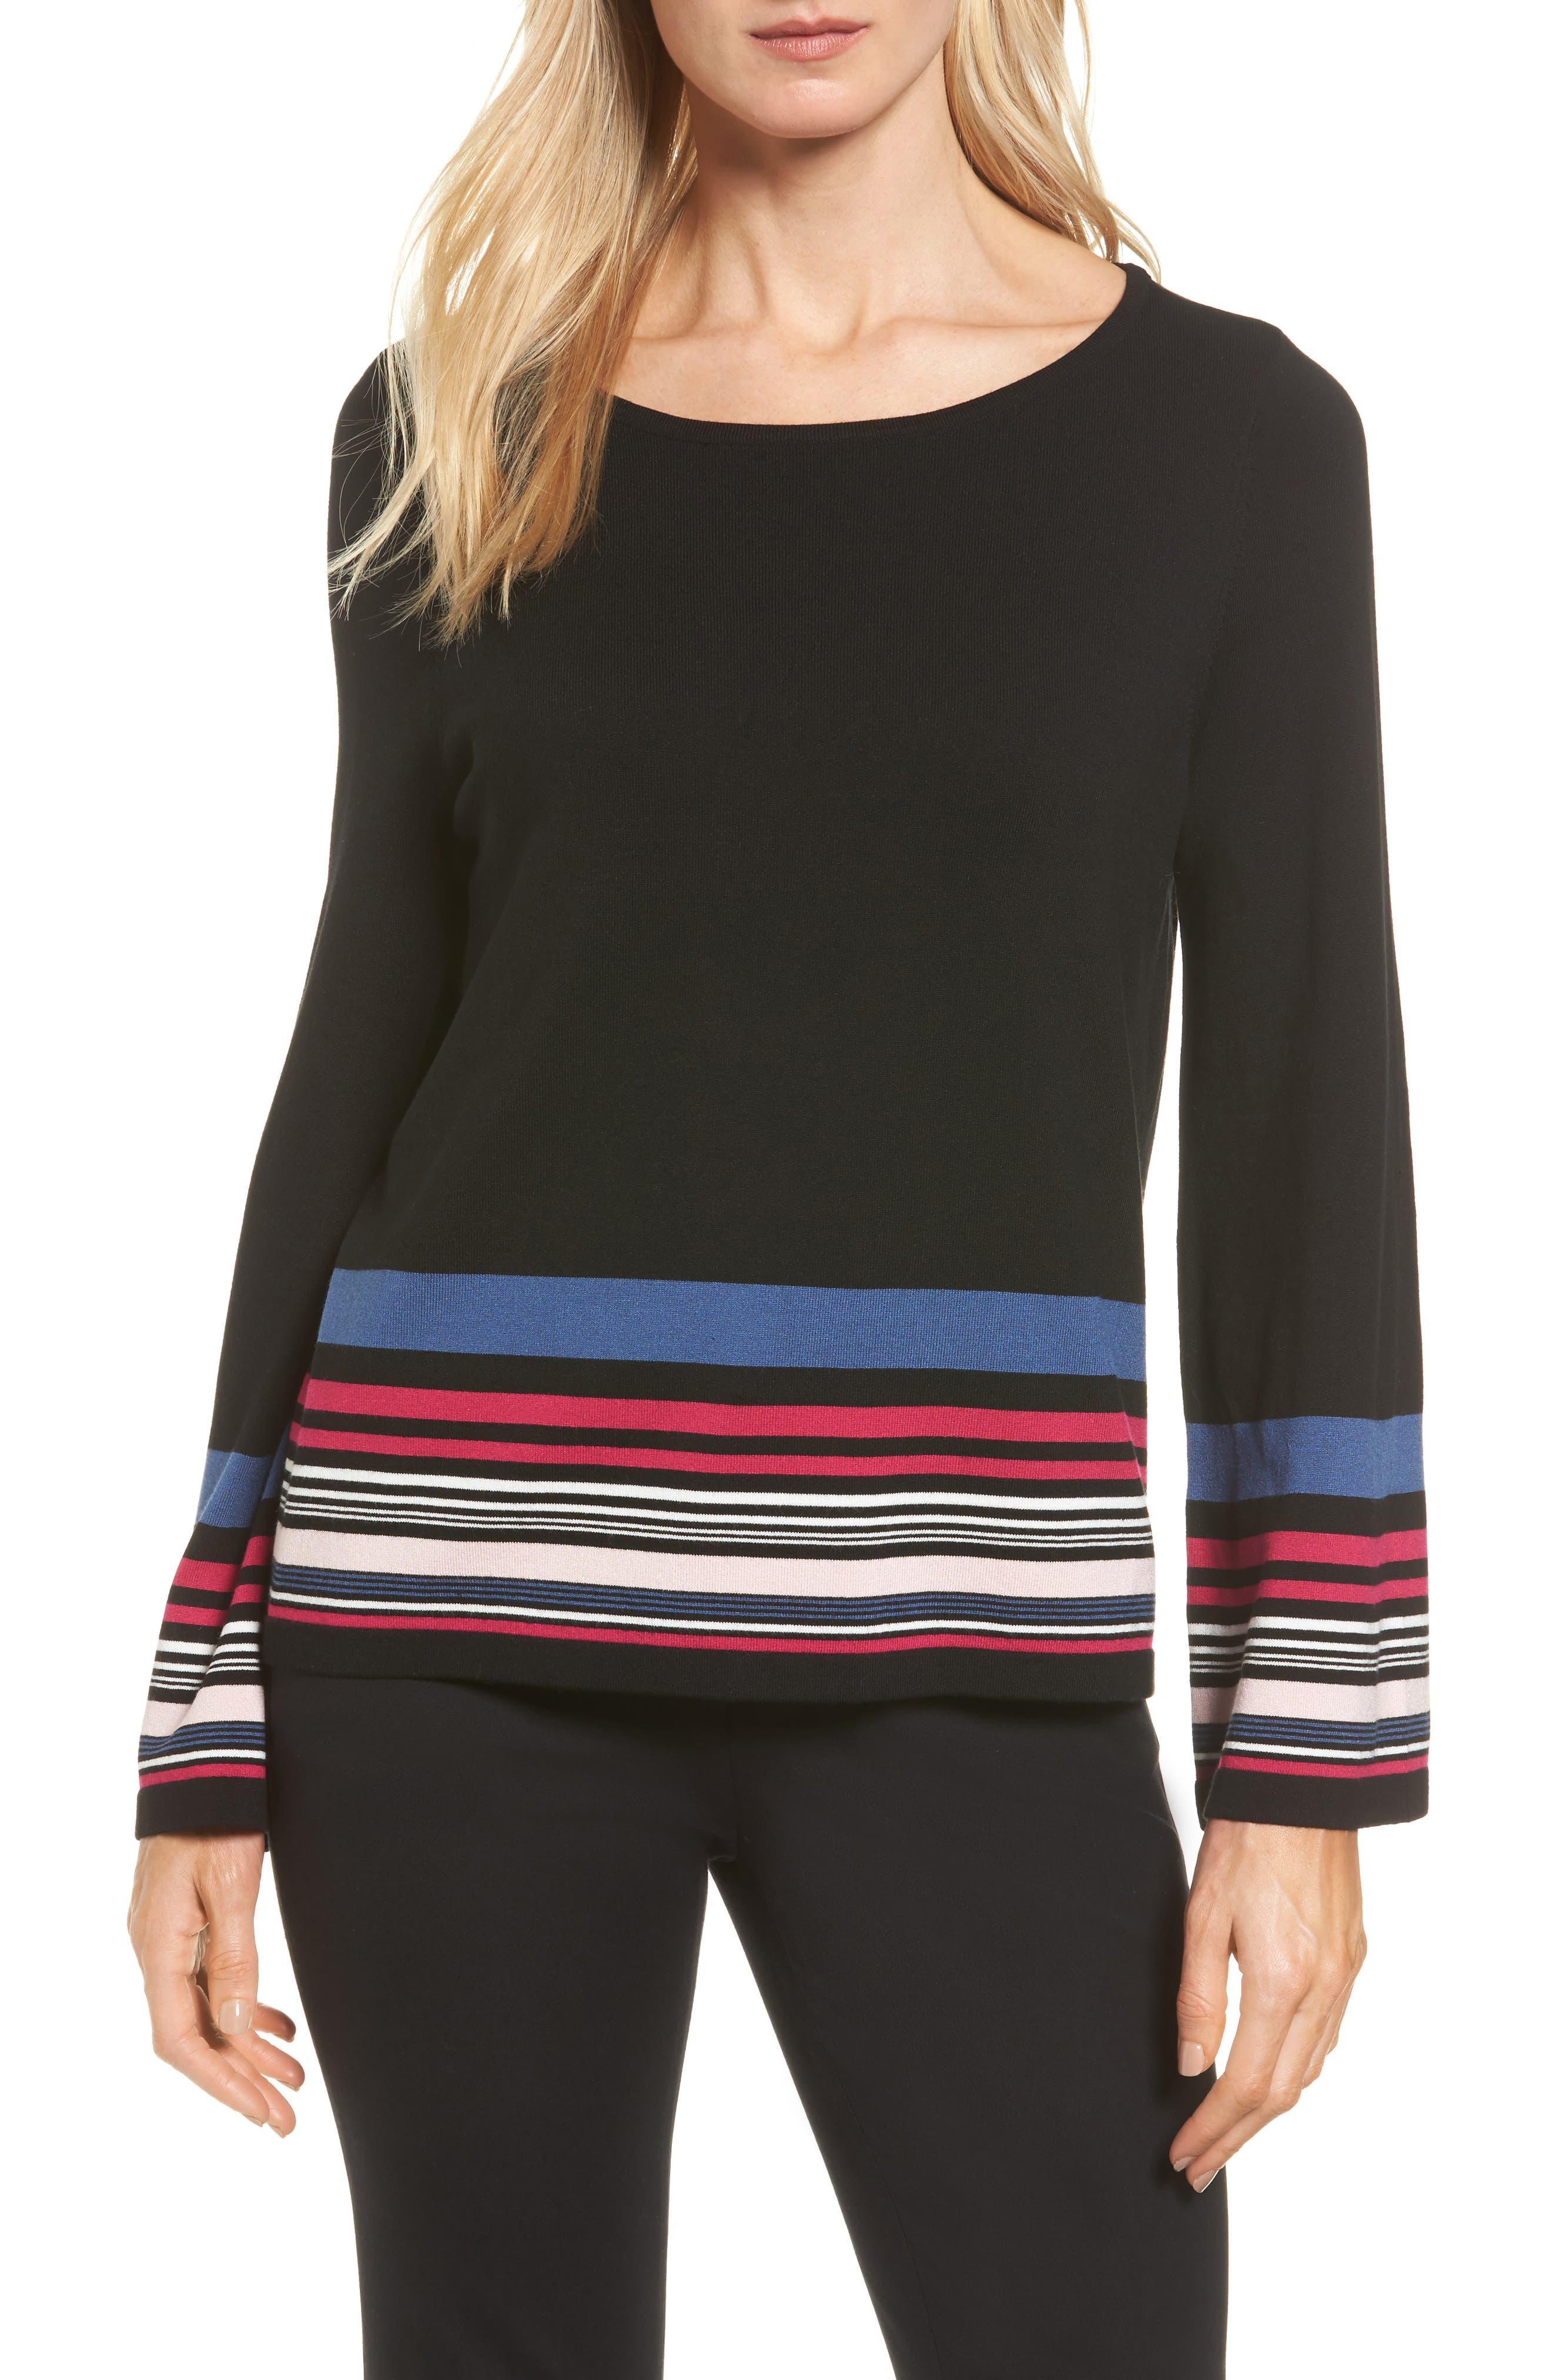 Vince Camuto Stripe Bell Sleeve Sweater (Regular & Petite)